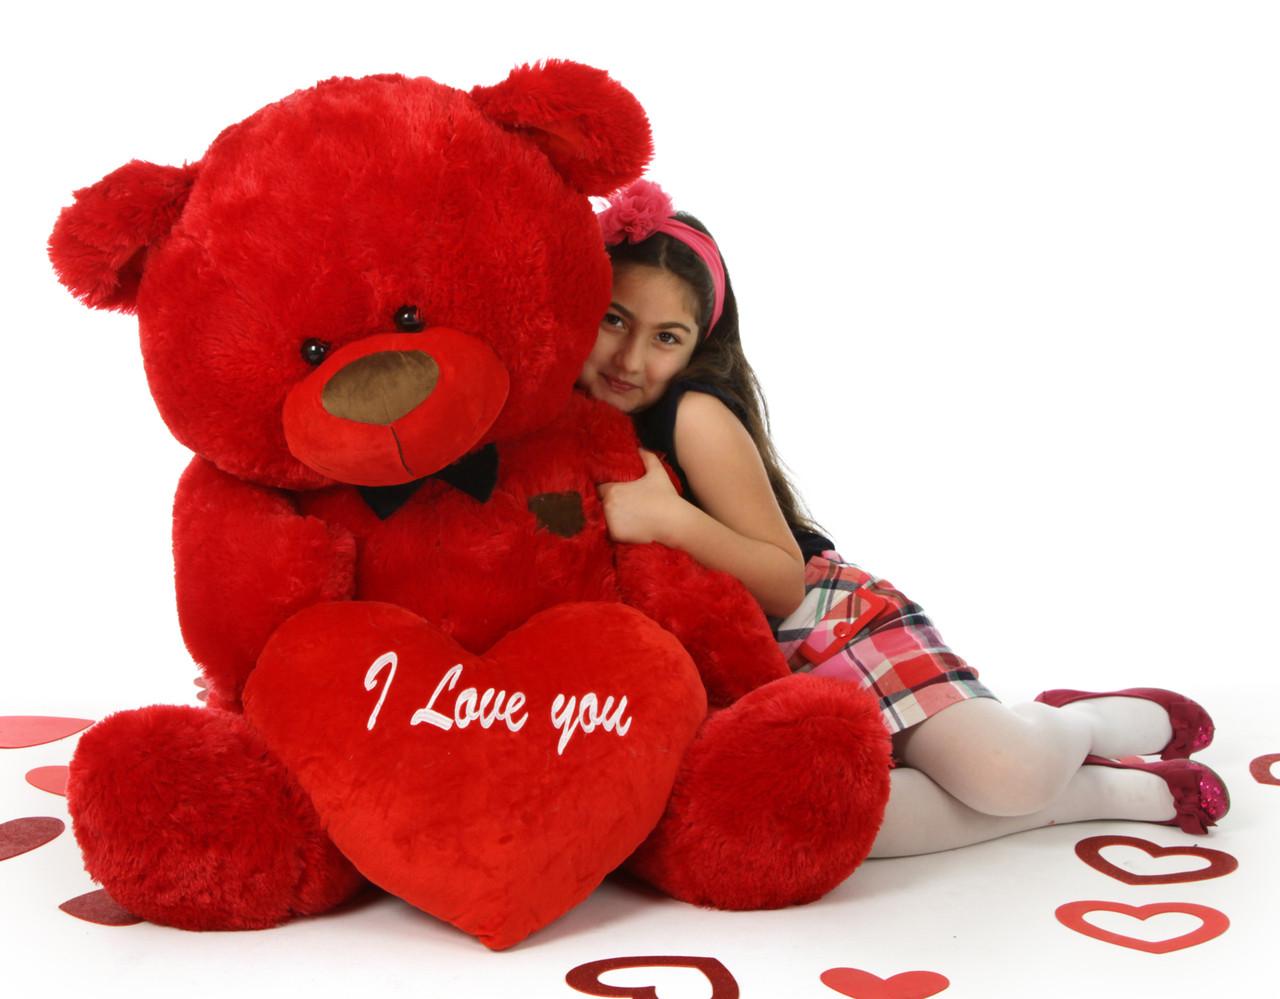 Giant Red Teddy Bear, Randy Shags 4 Foot